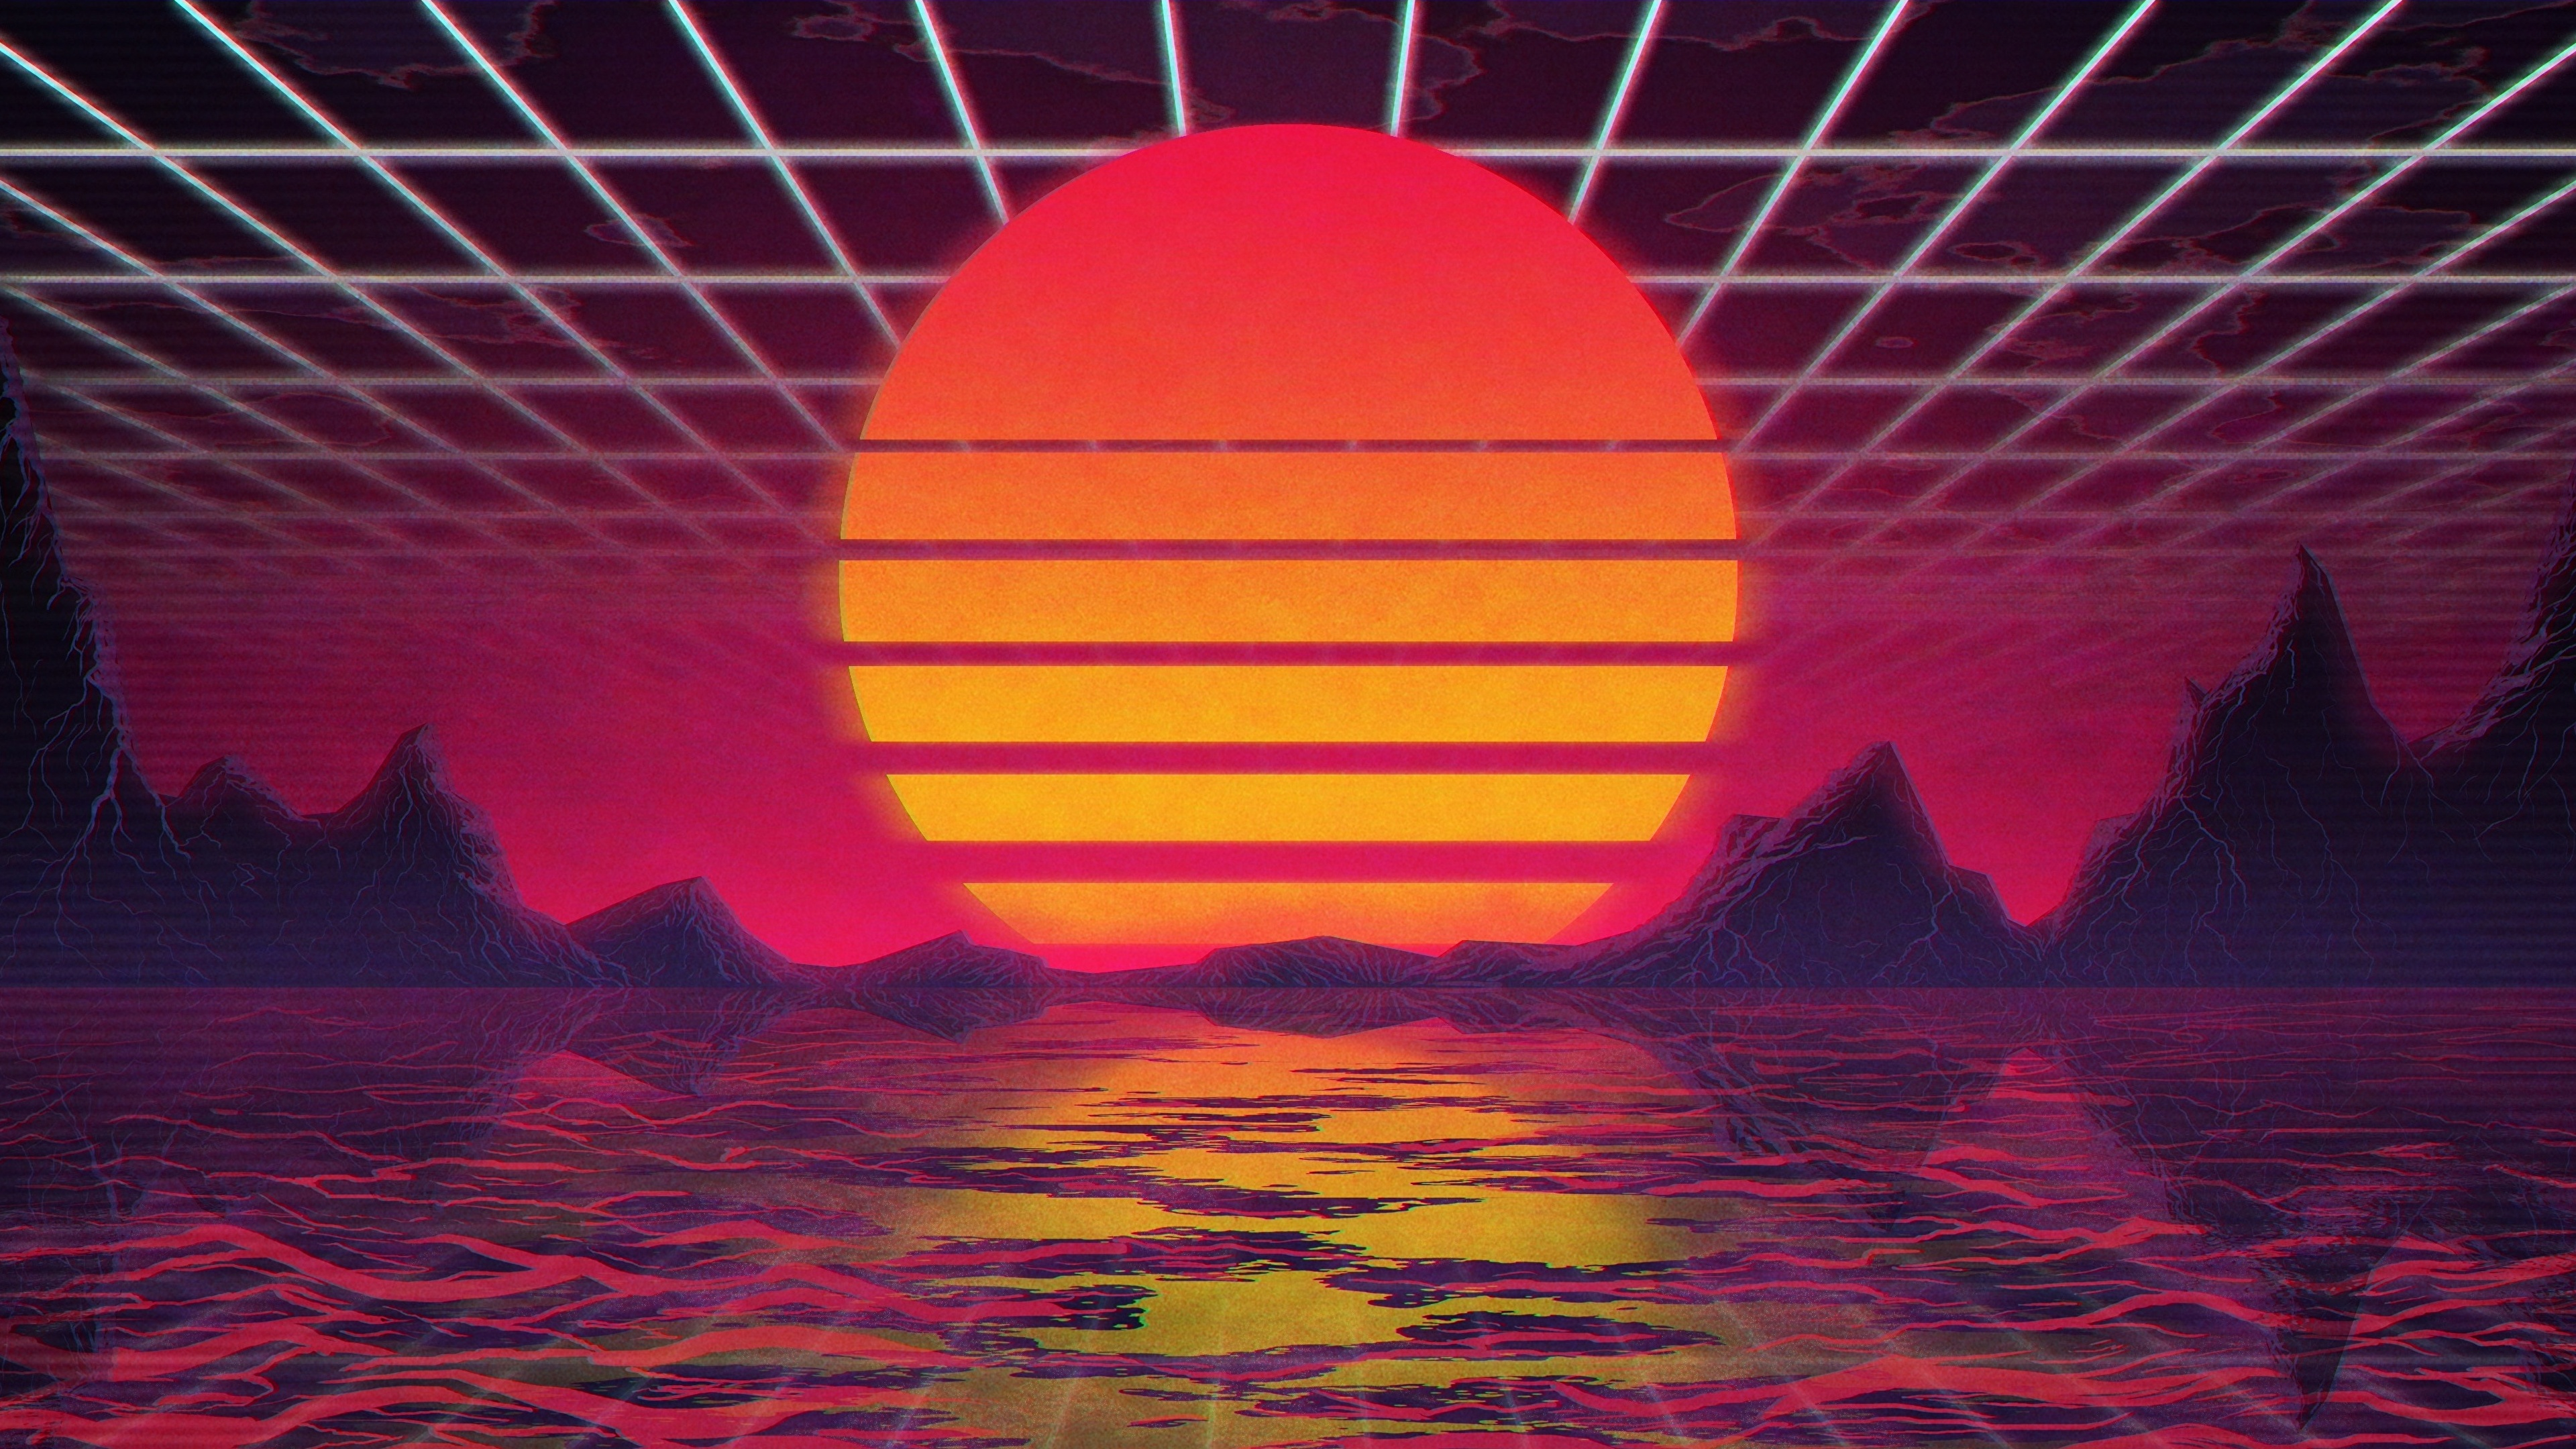 Photo Retrowave Sun Sunrise And Sunset 3840x2160